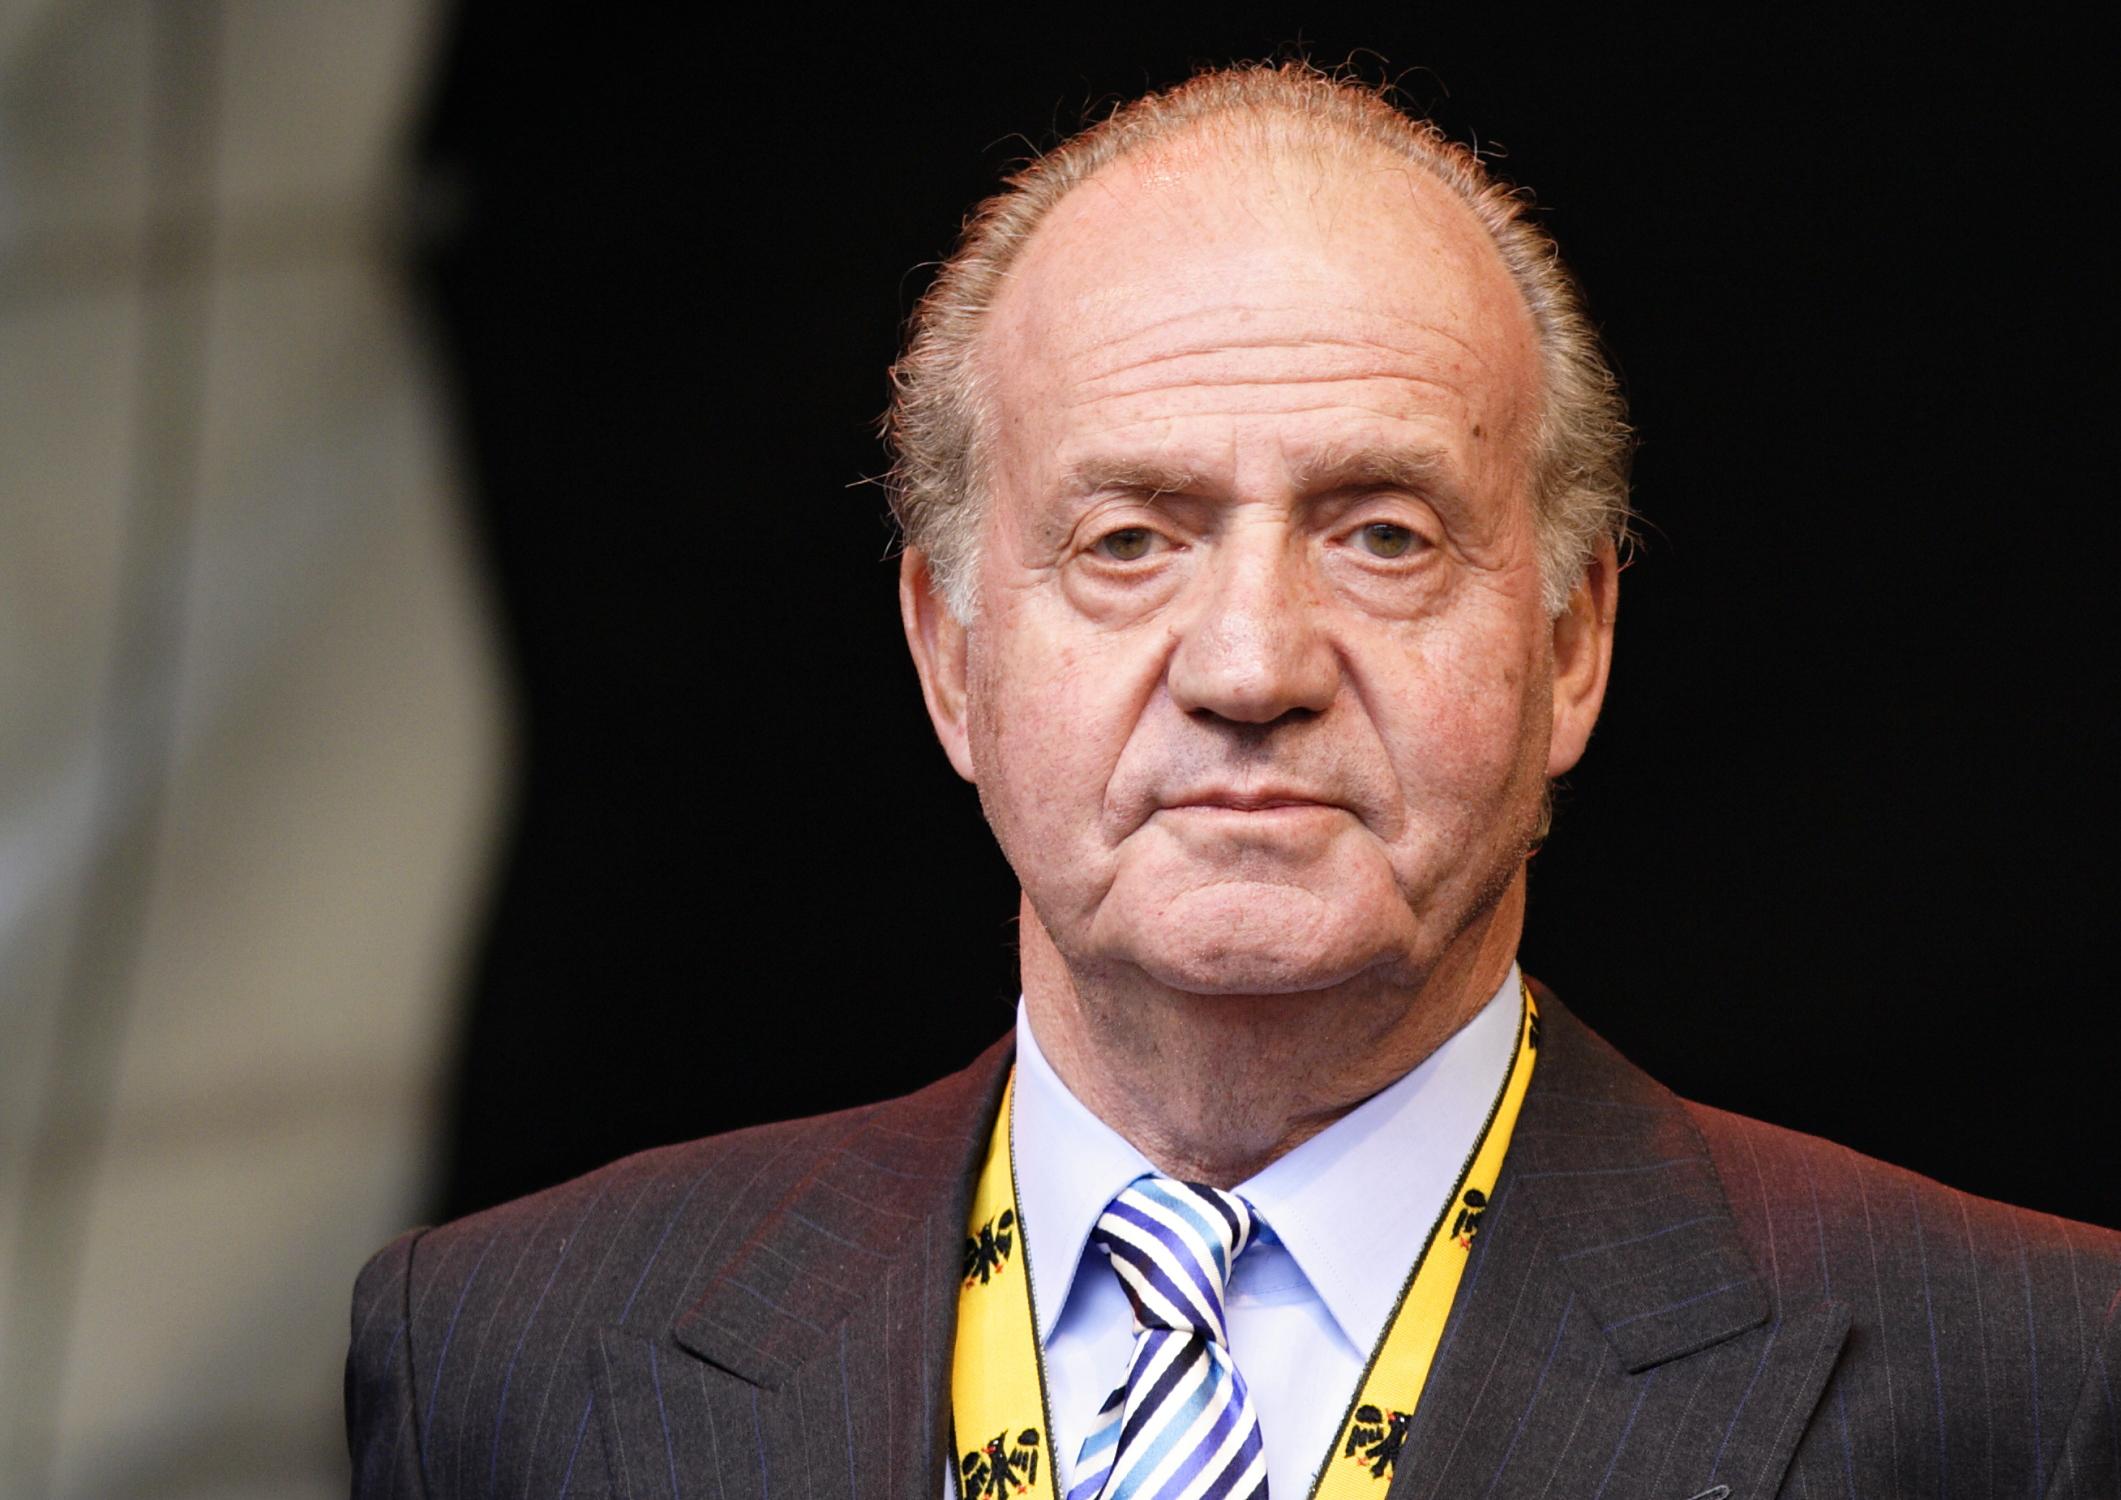 Rei Joan Carles periodisme monarquia espanyola